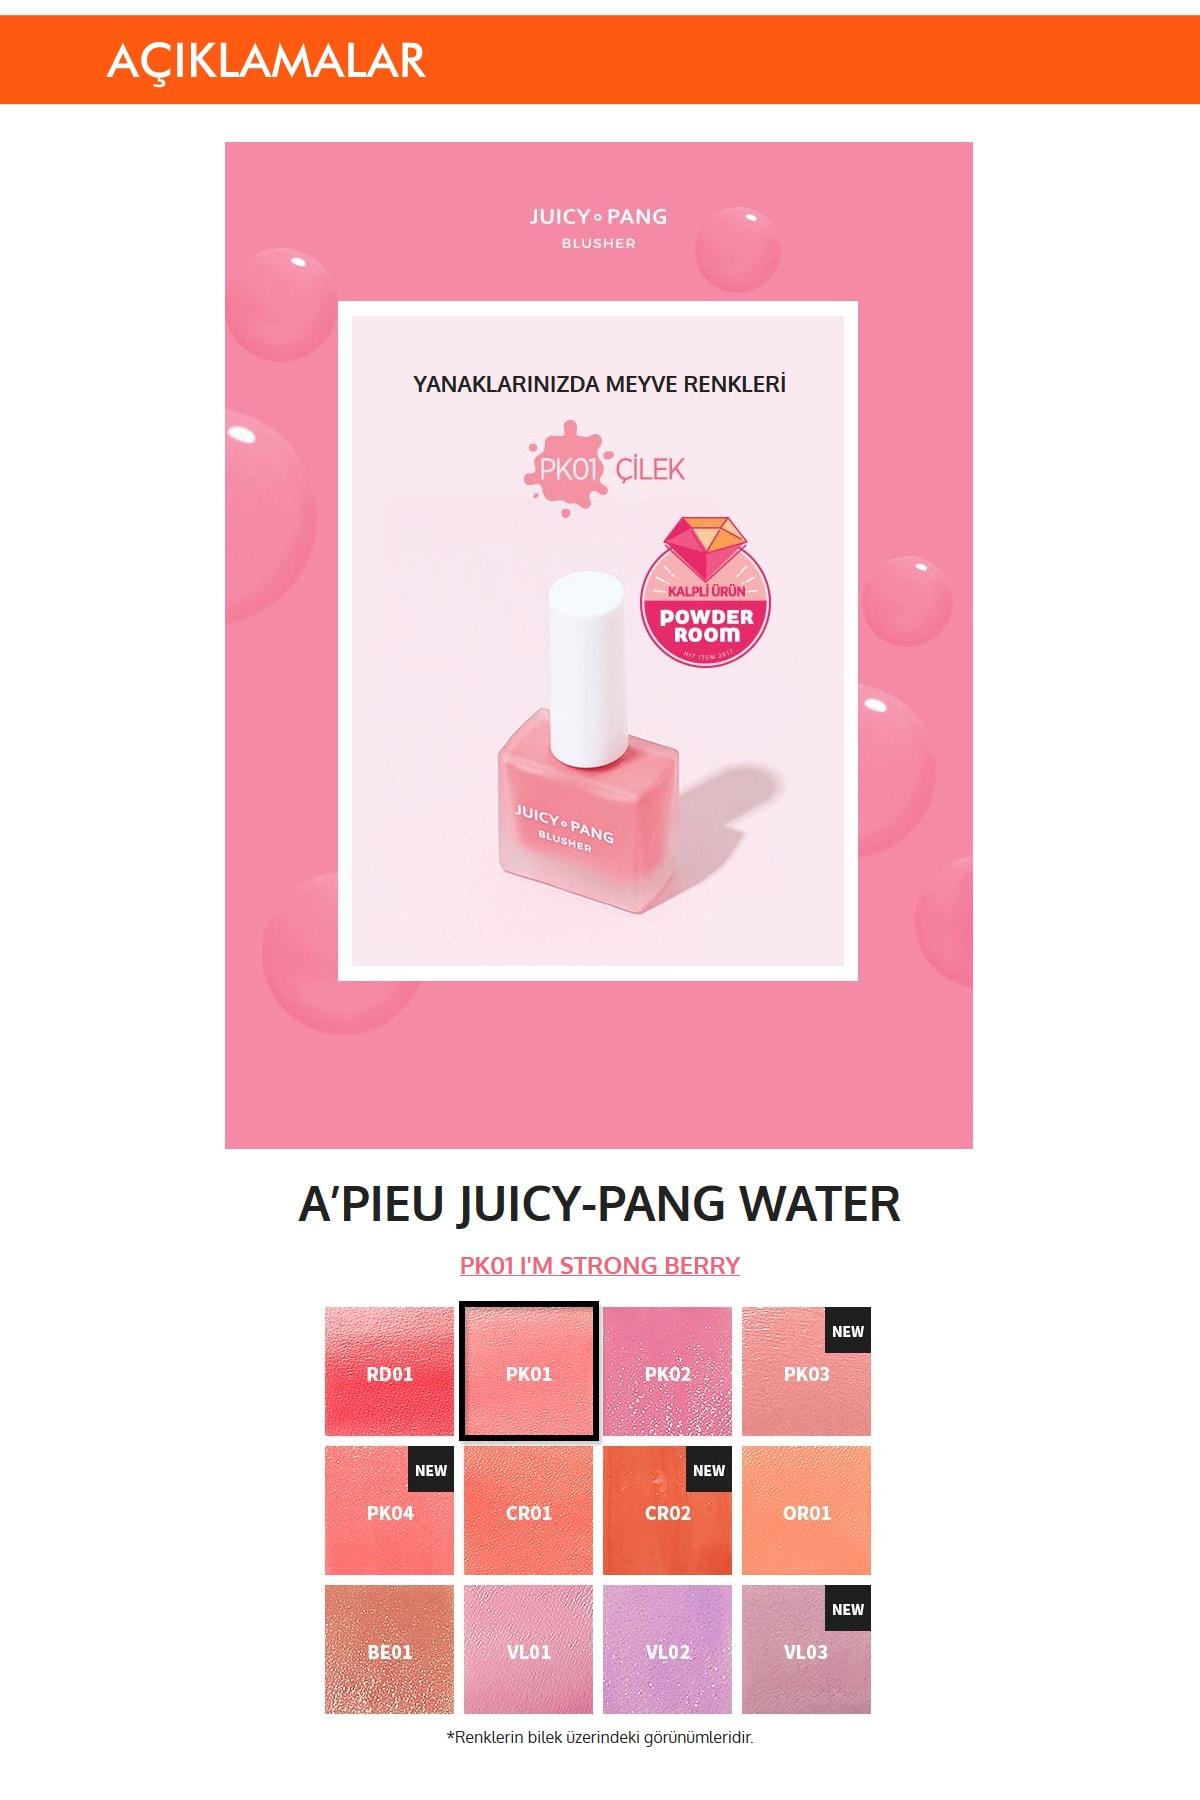 Missha Doğal Görünüm Sunan Nemlendirici Likit Allık 9g. APIEU Juicy-Pang Water Blusher (PK01) 1